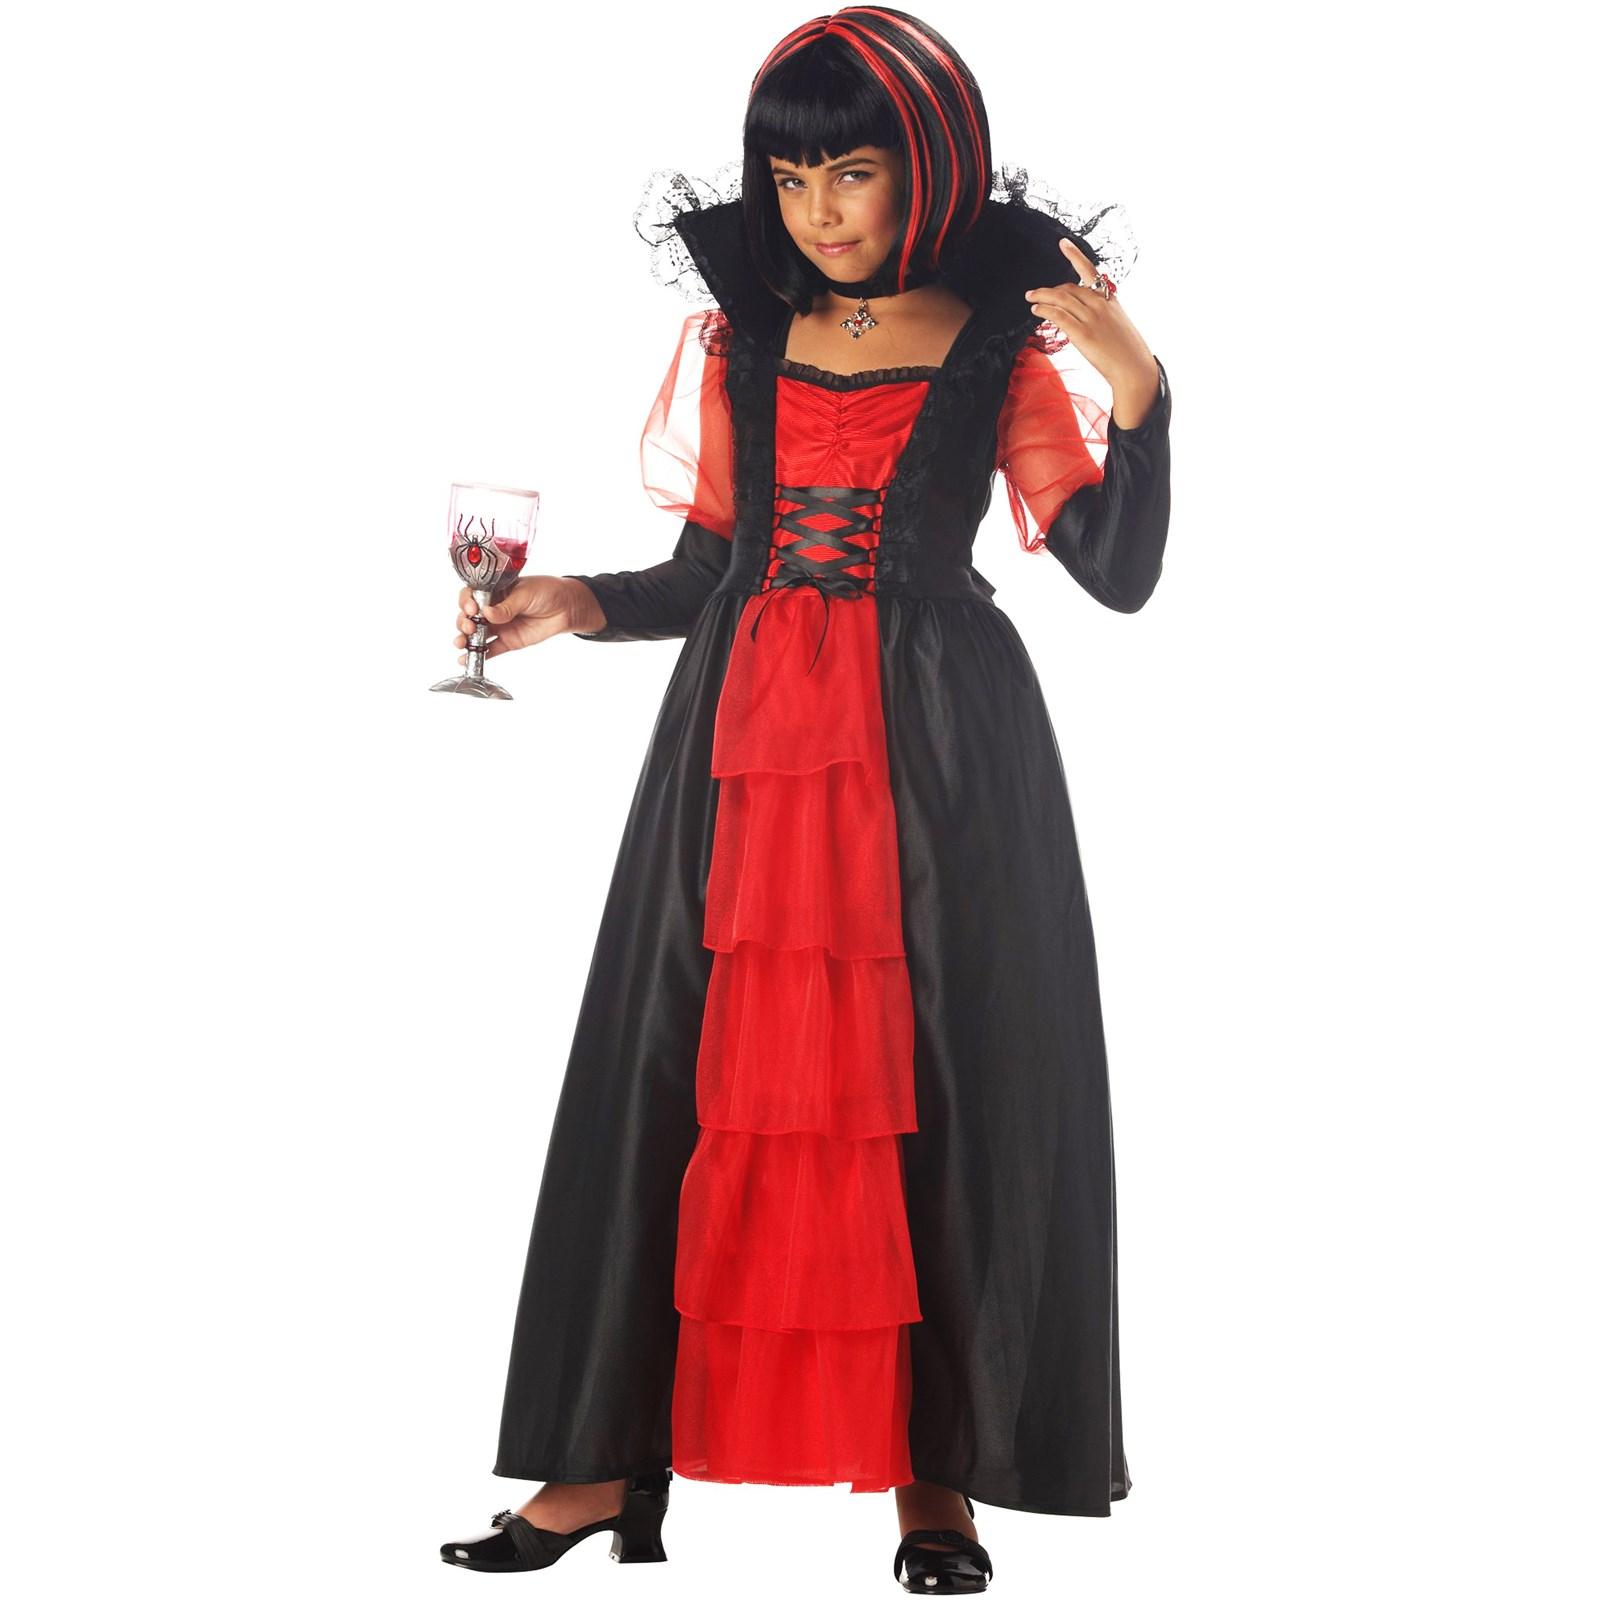 regal vampira girl costume. Black Bedroom Furniture Sets. Home Design Ideas